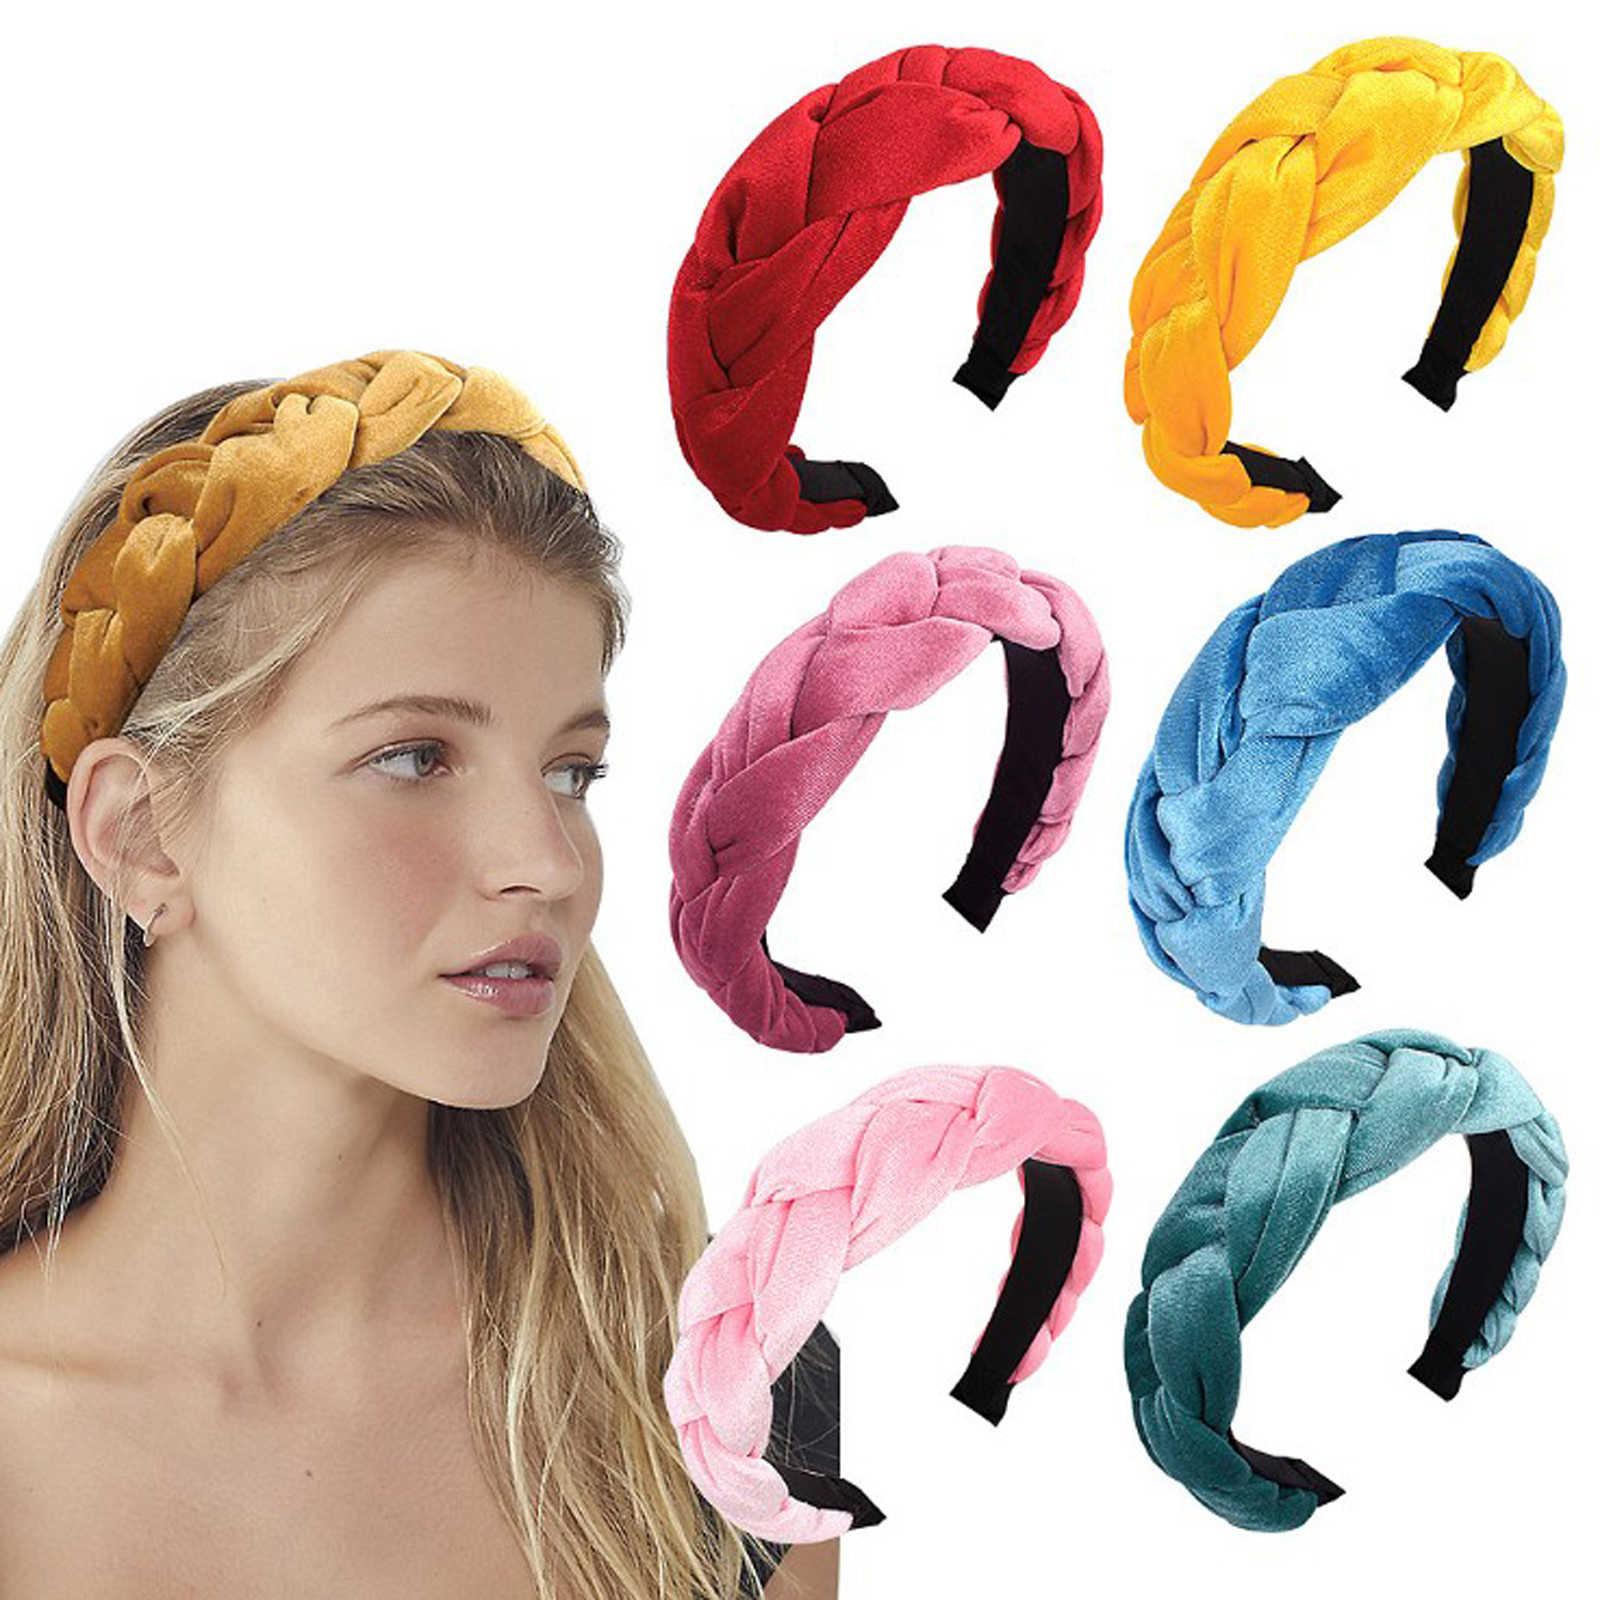 The New fashional Girls Sweet Thick Sponge Wide Hairband Headband HOT